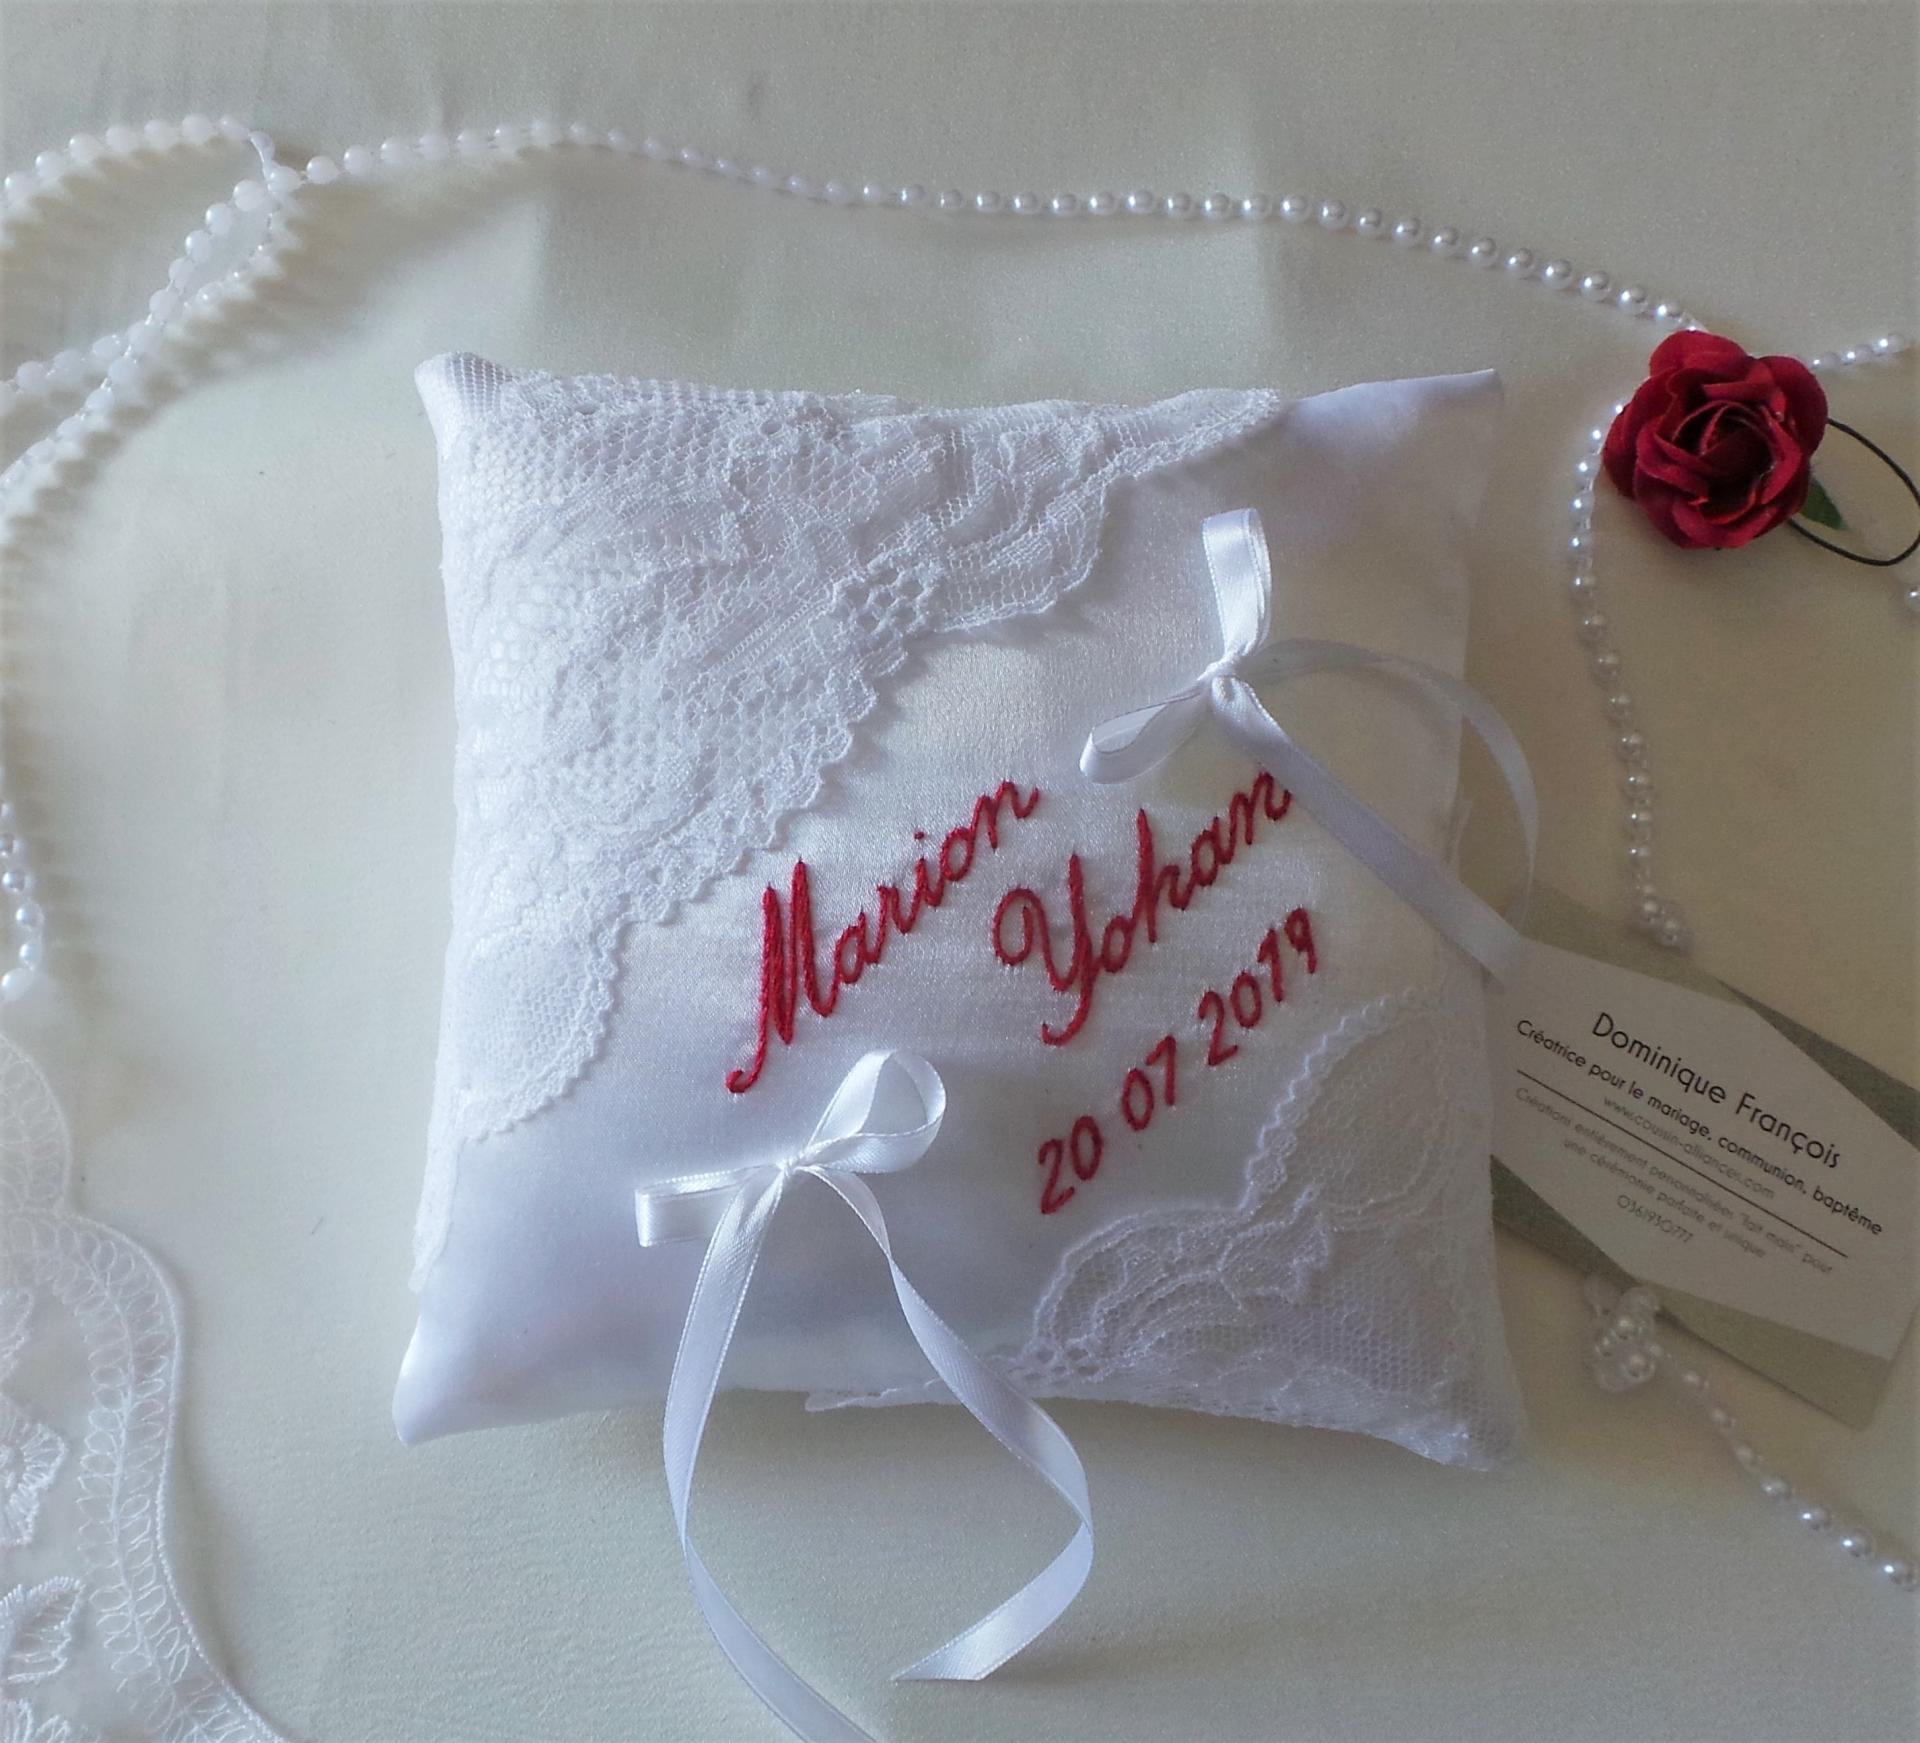 Coussin mariage chic dentelle calais blanc rouge 2